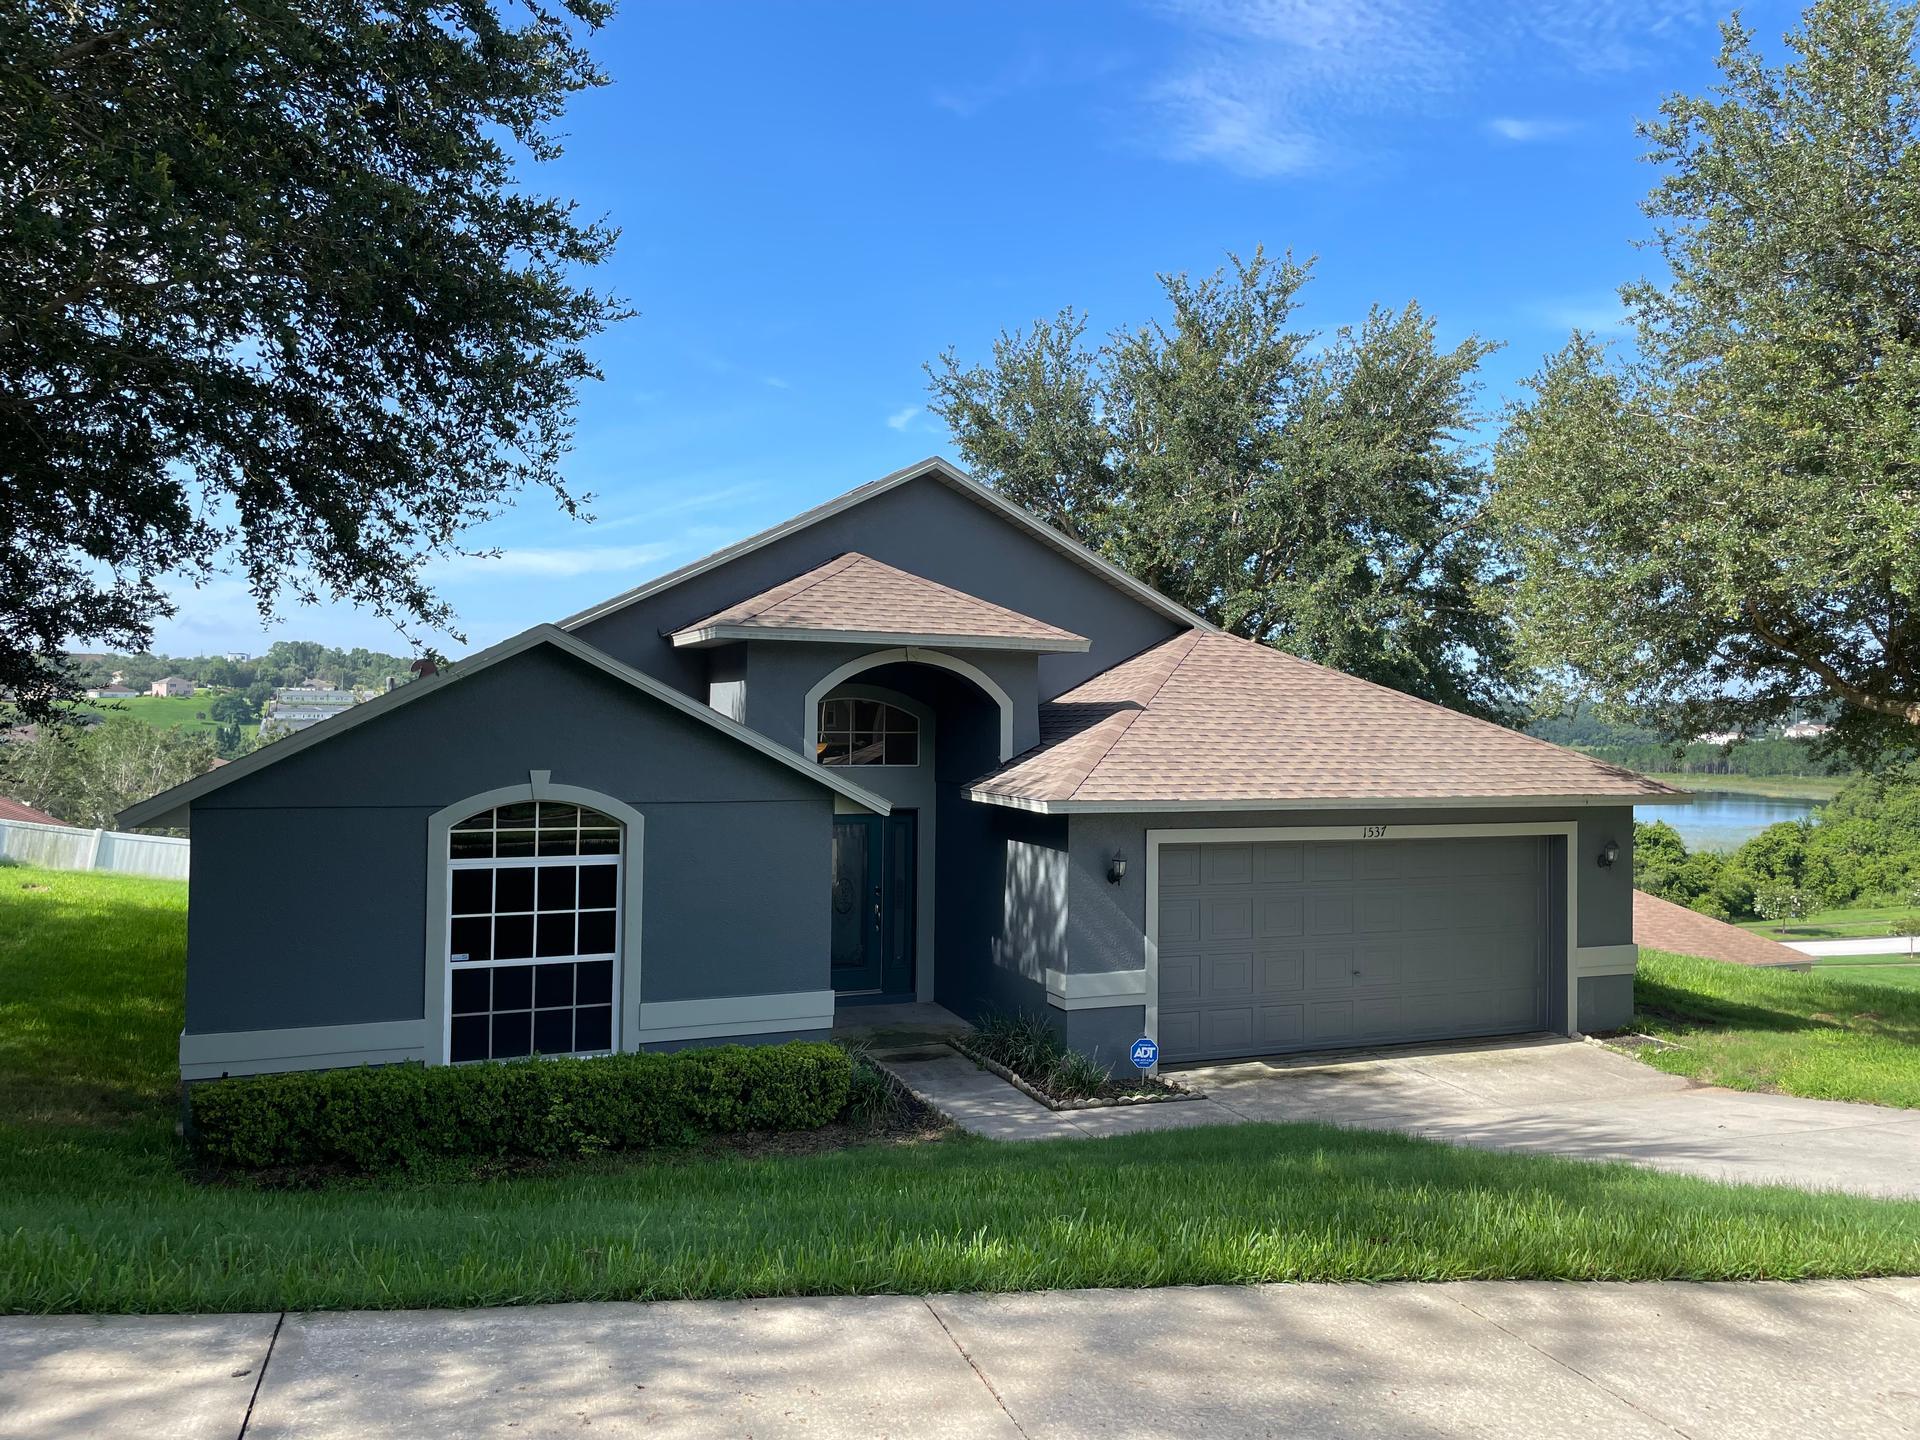 Photo of property: 1537 Nightfall Drive Clermont, FL 34711